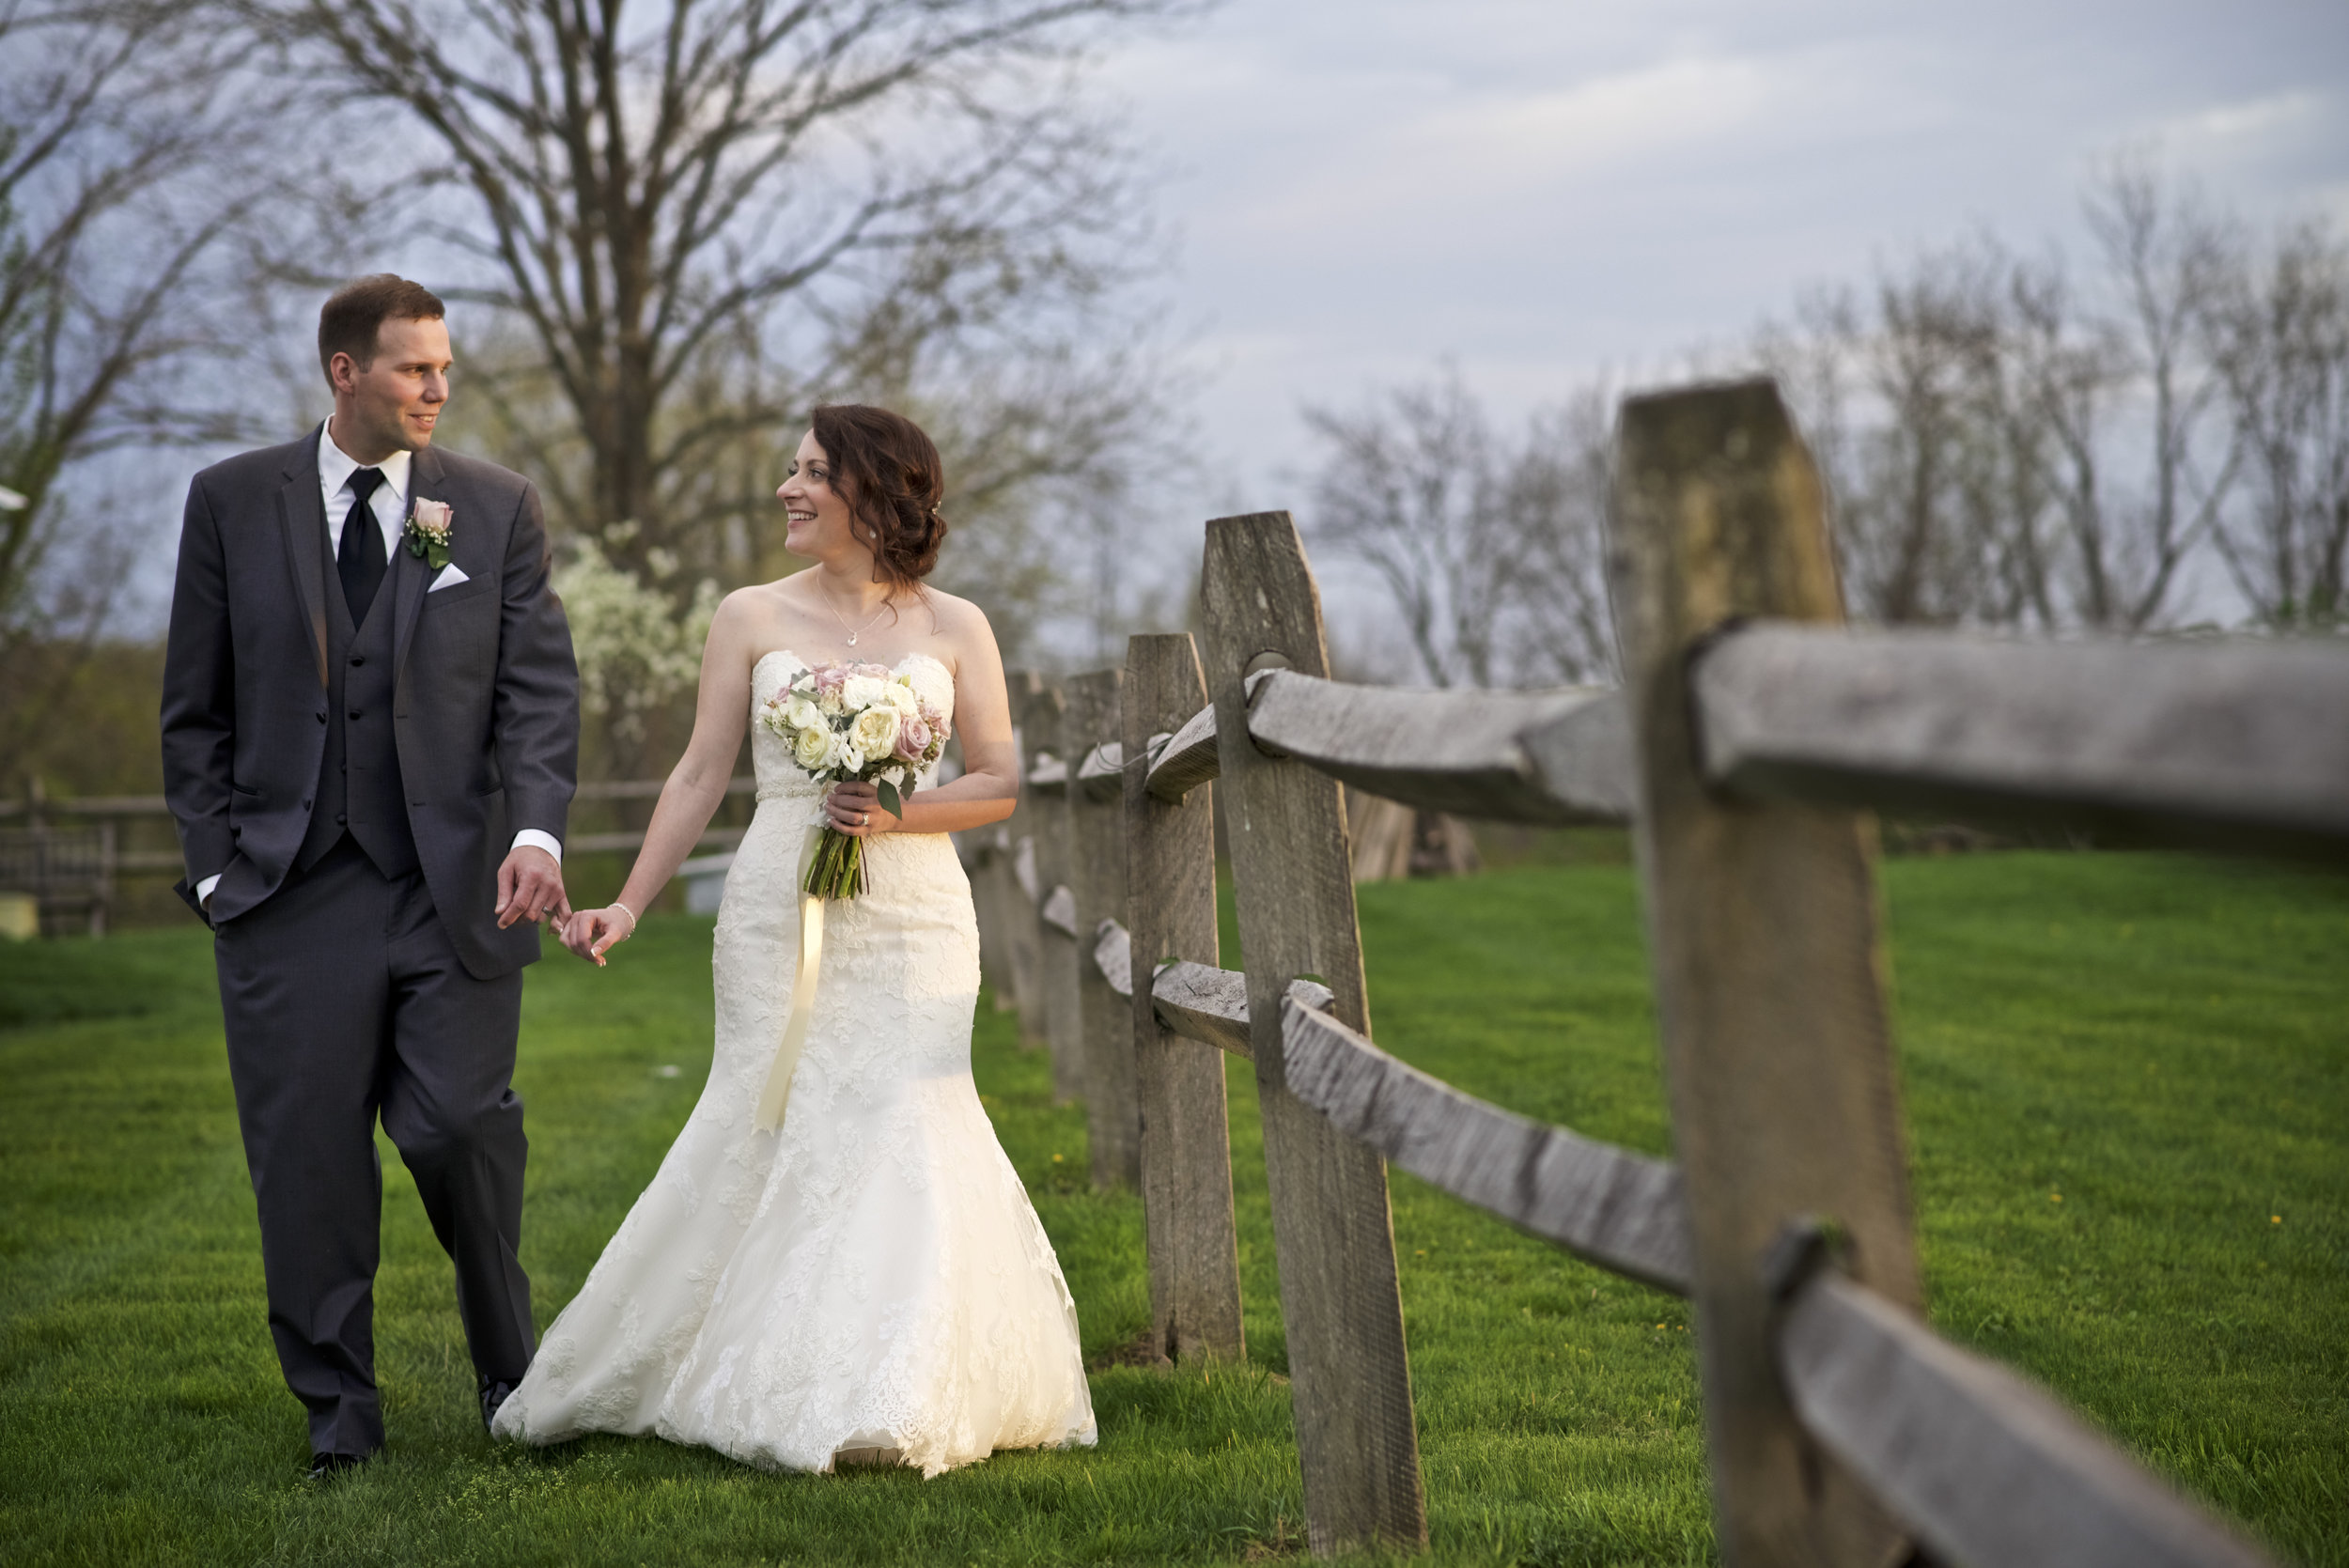 Lippincott manor wedding, wallkill ny wedding, photography, photos z.jpg